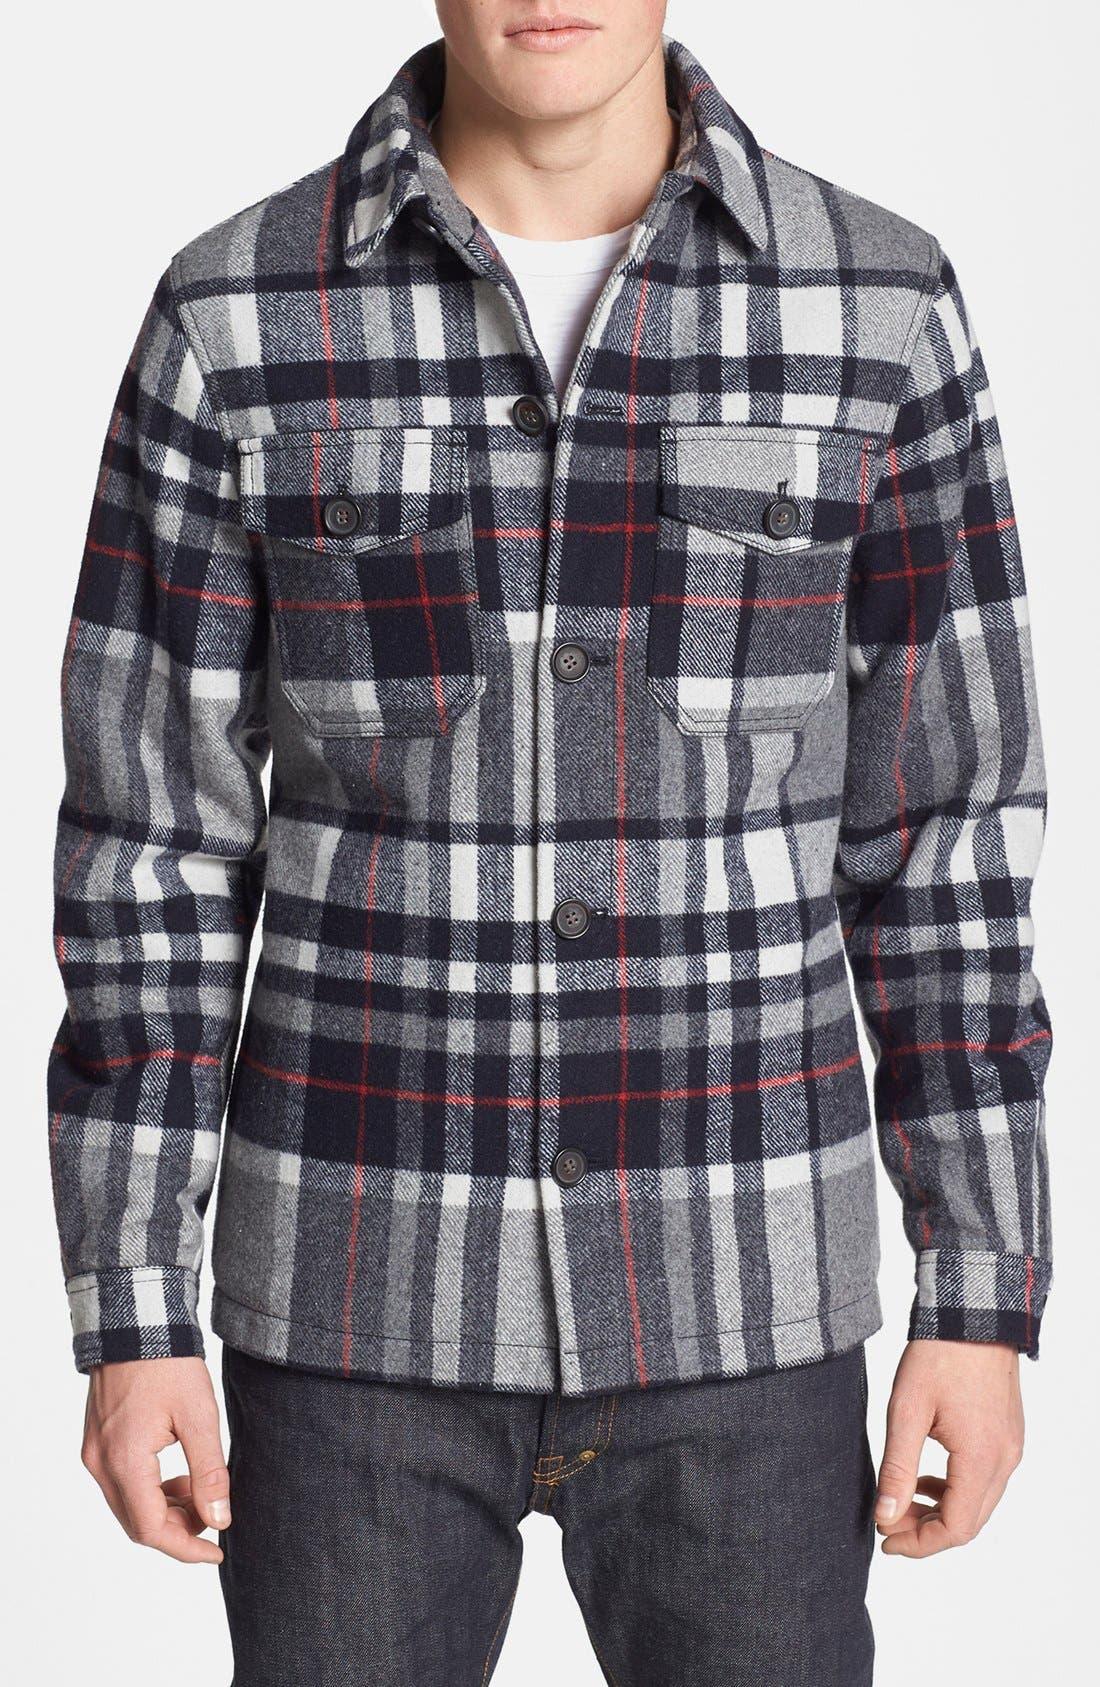 Alternate Image 1 Selected - Topman Check Wool Blend Flannel Shirt Jacket